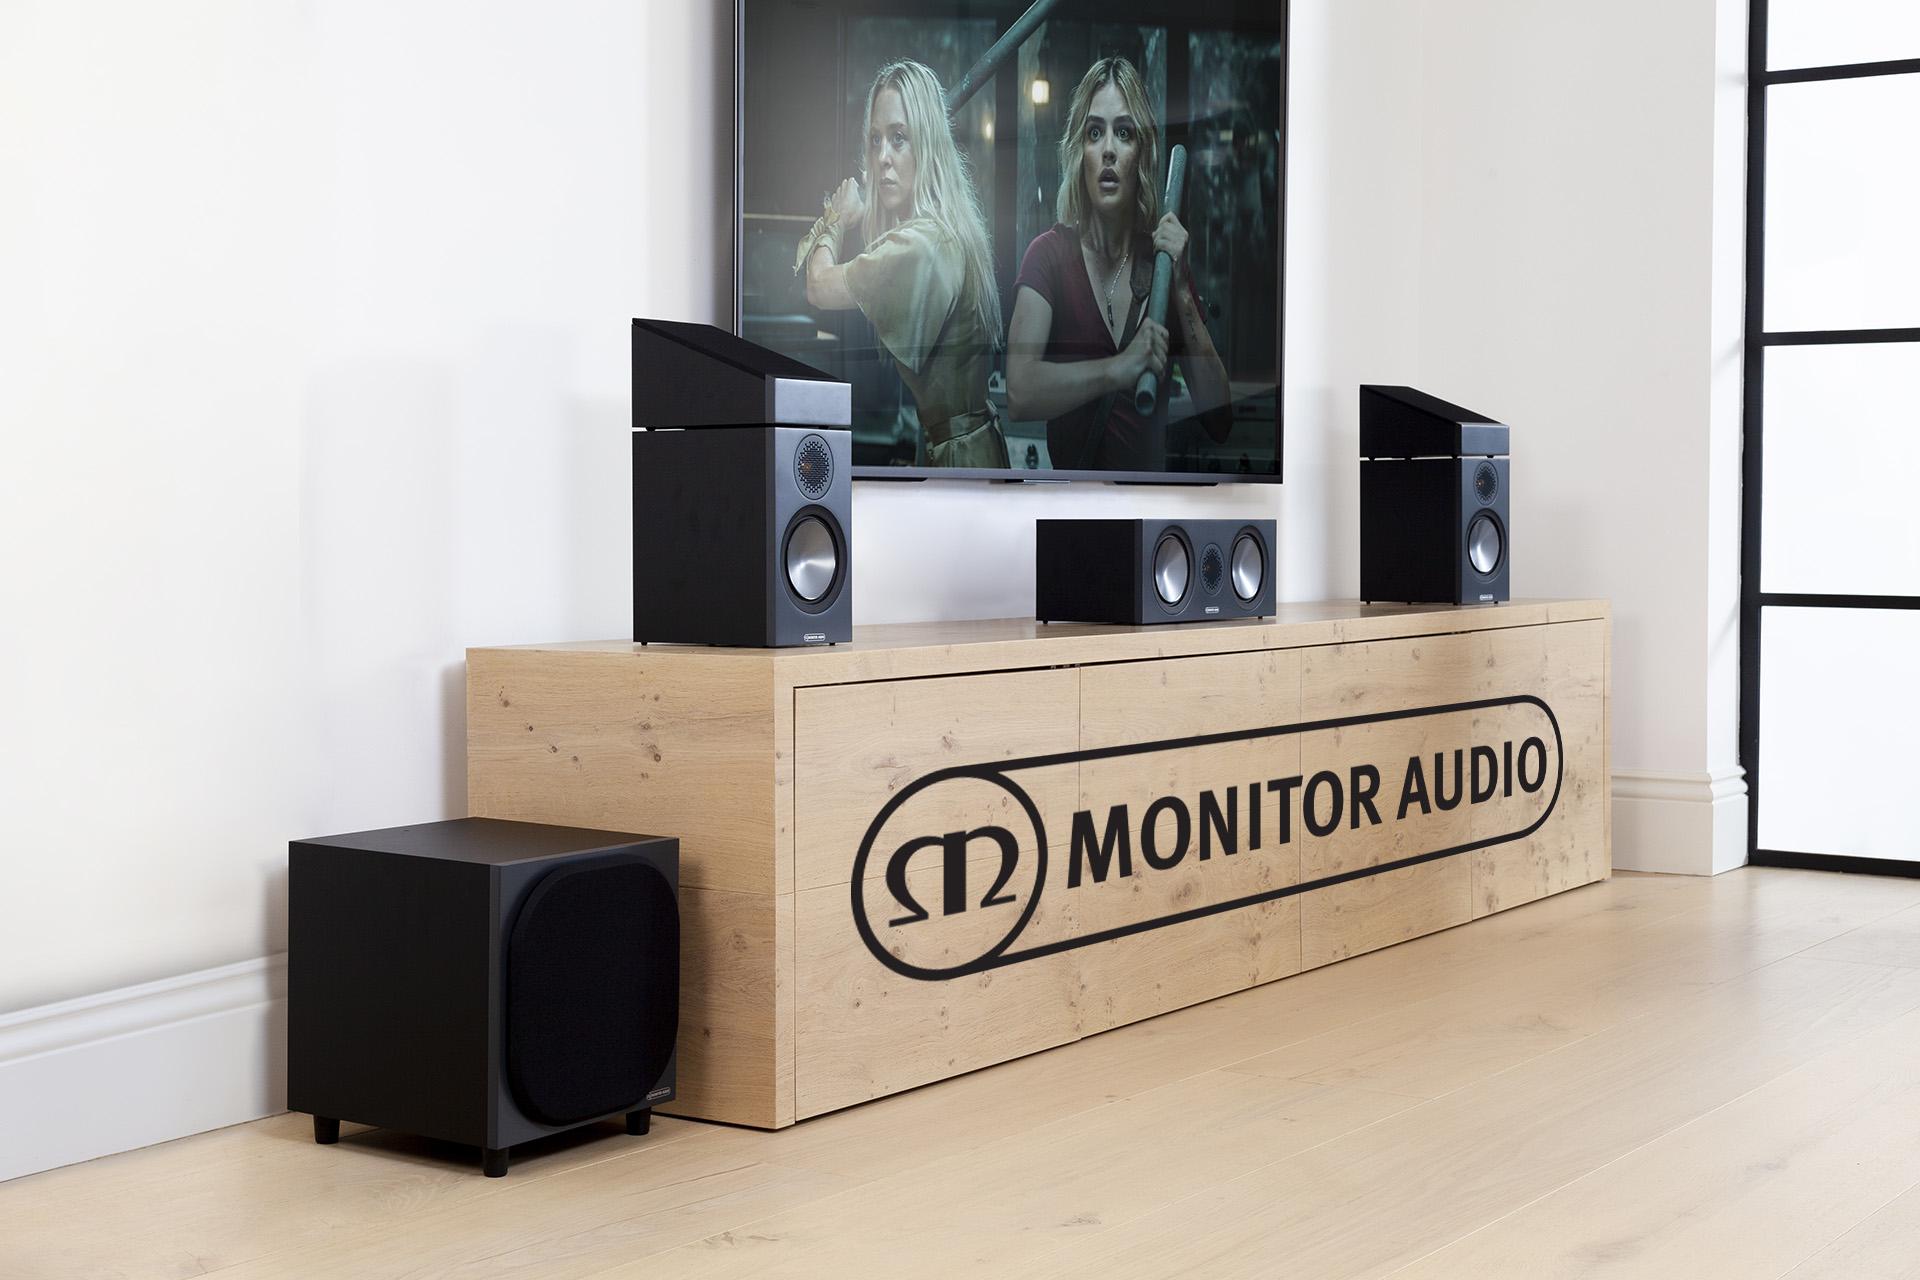 Представители Monitor Audio – в прямом эфире на канале Pult.ru